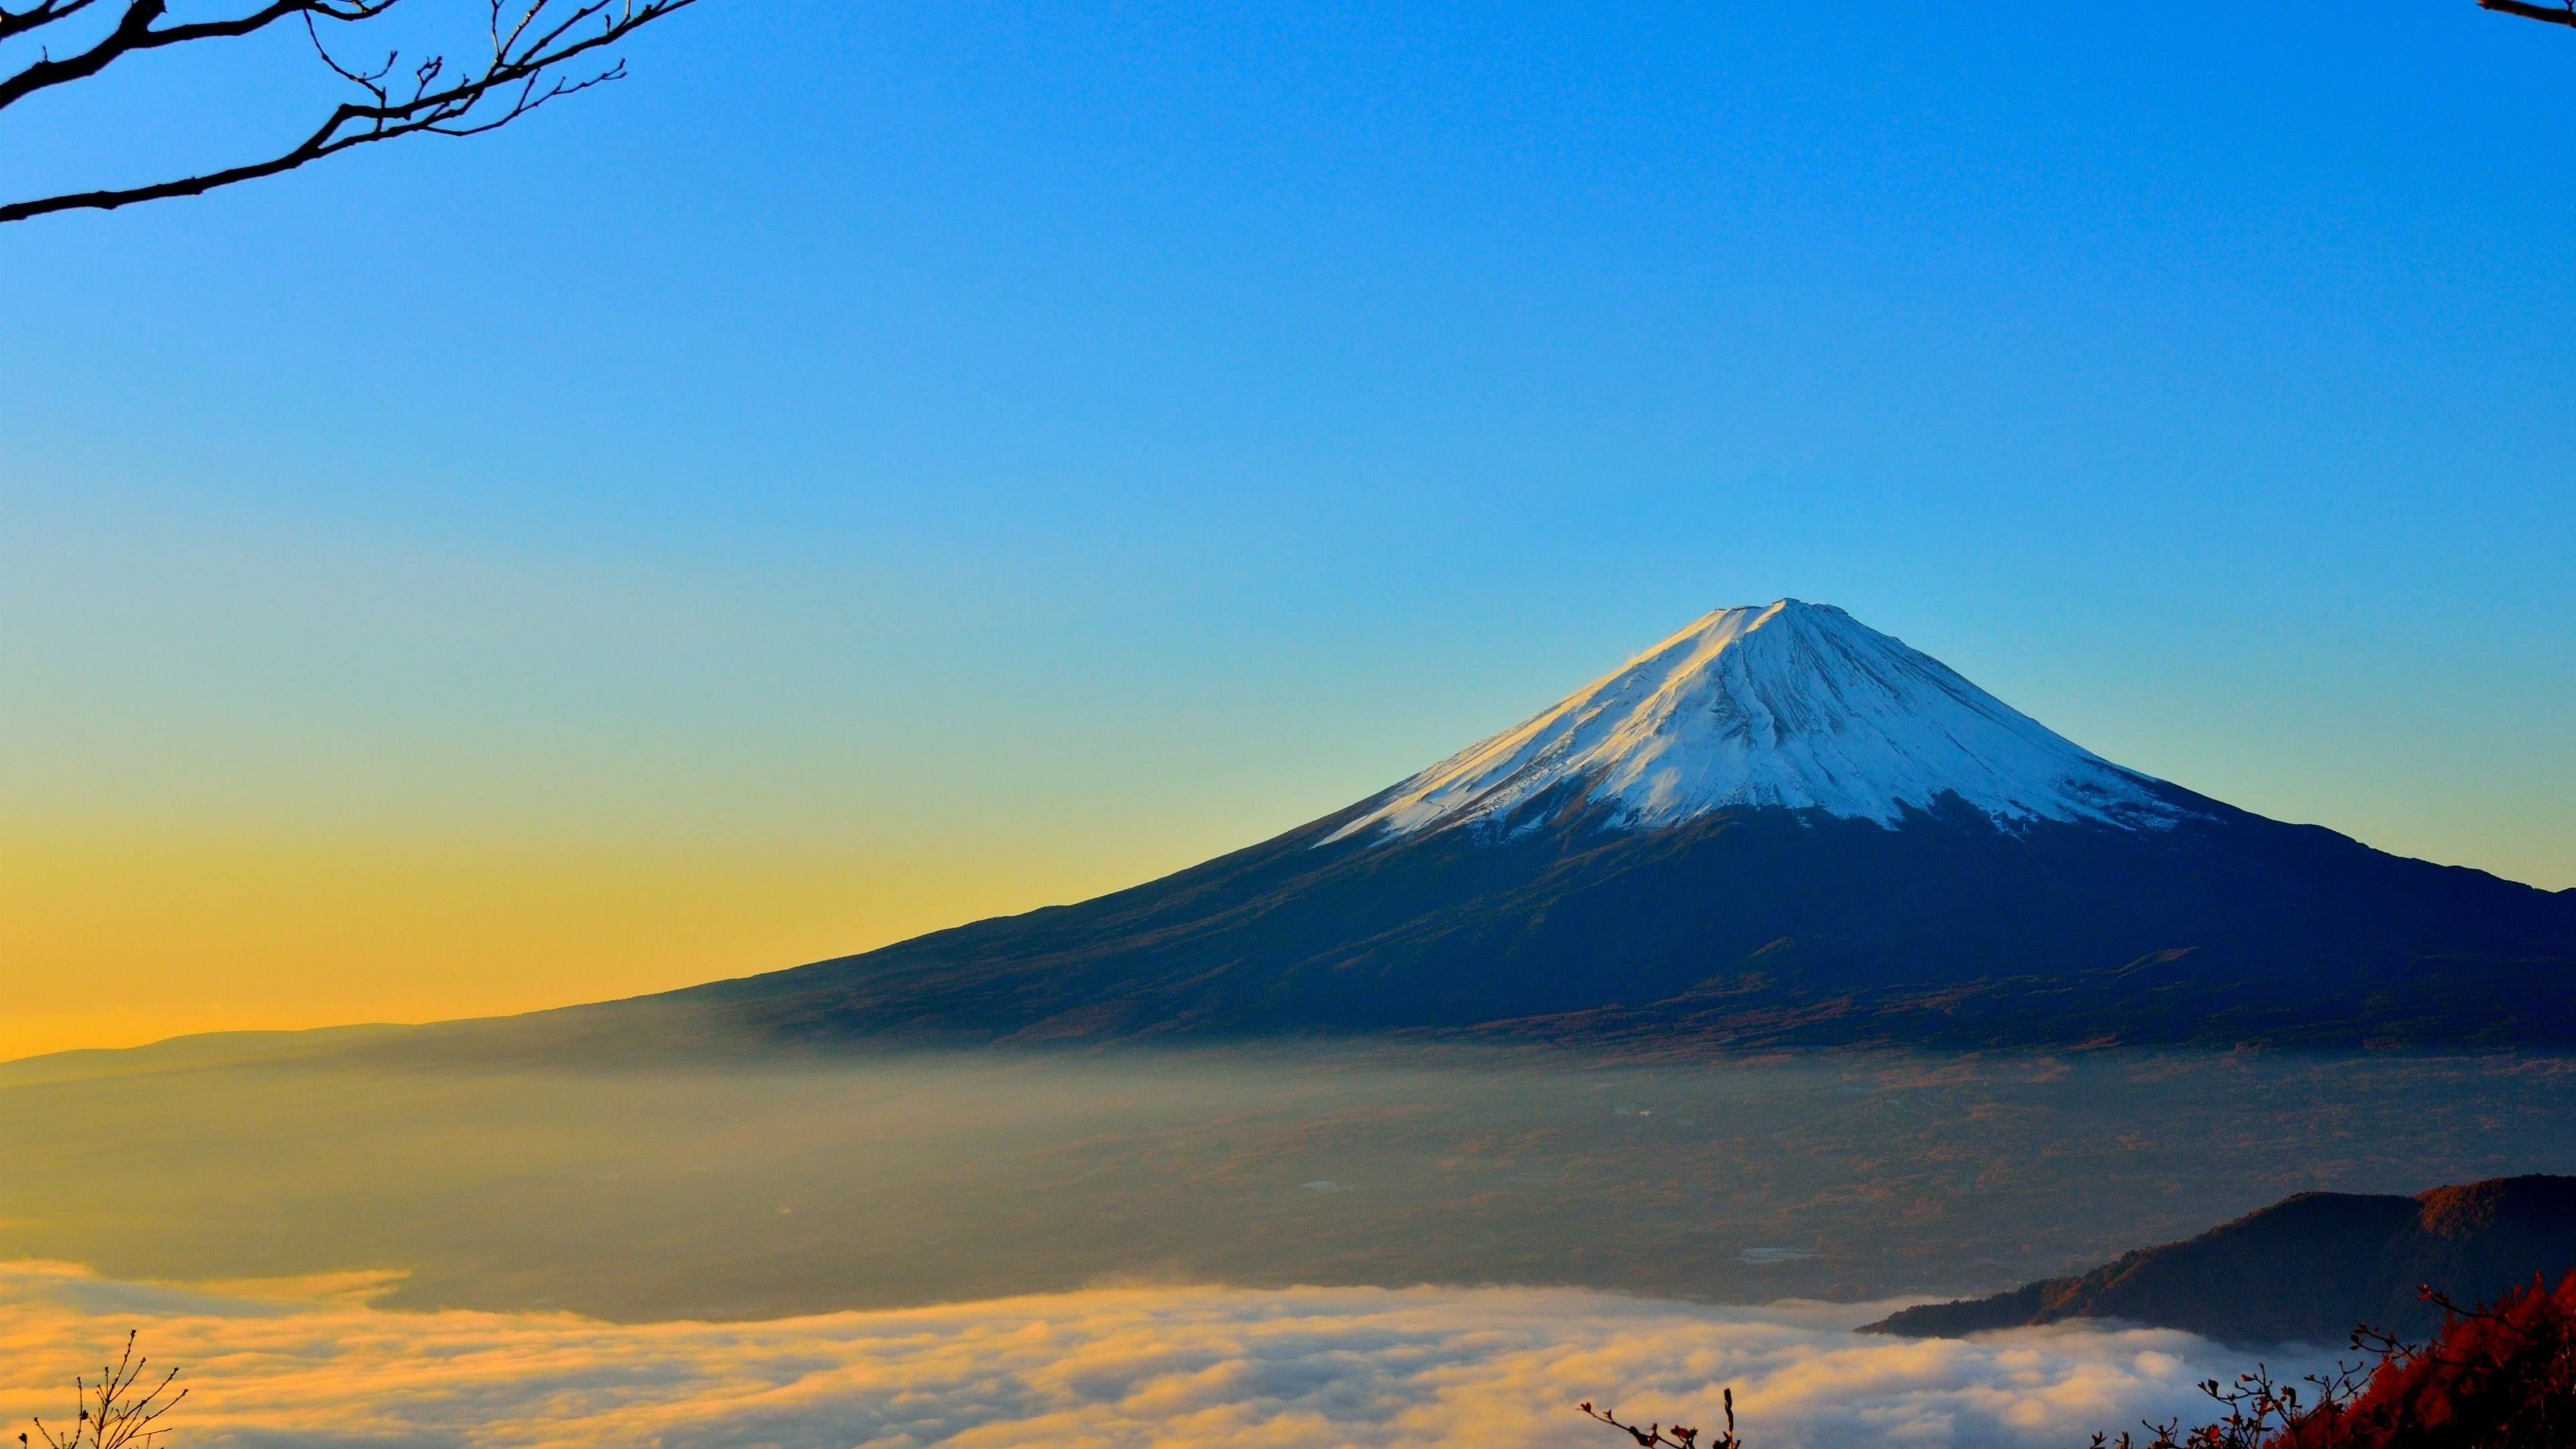 64 Mt Fuji Wallpapers on WallpaperPlay 3840x2160